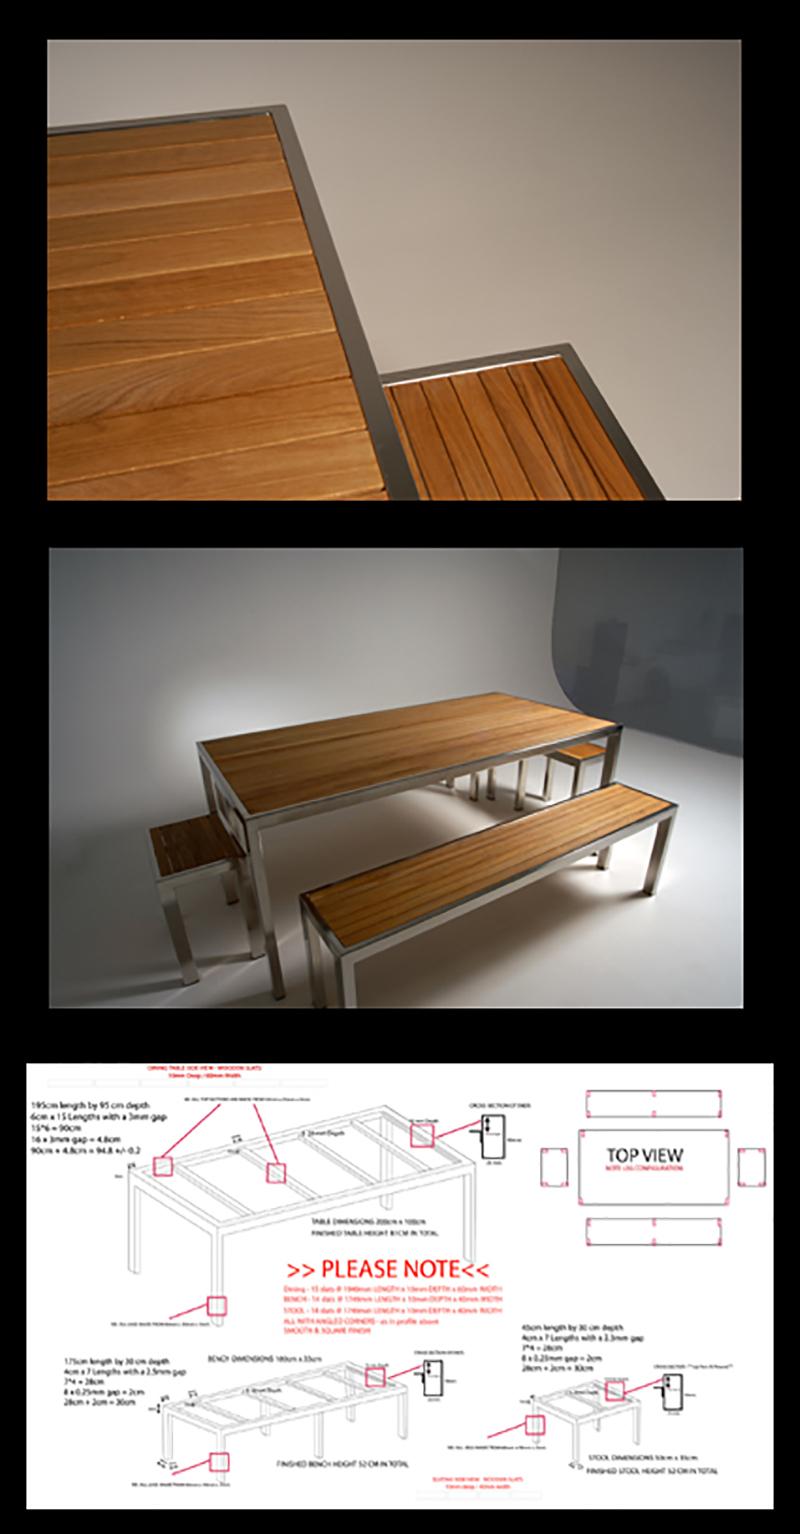 life furniture design by artist alexander james hamilton distil ennui studio